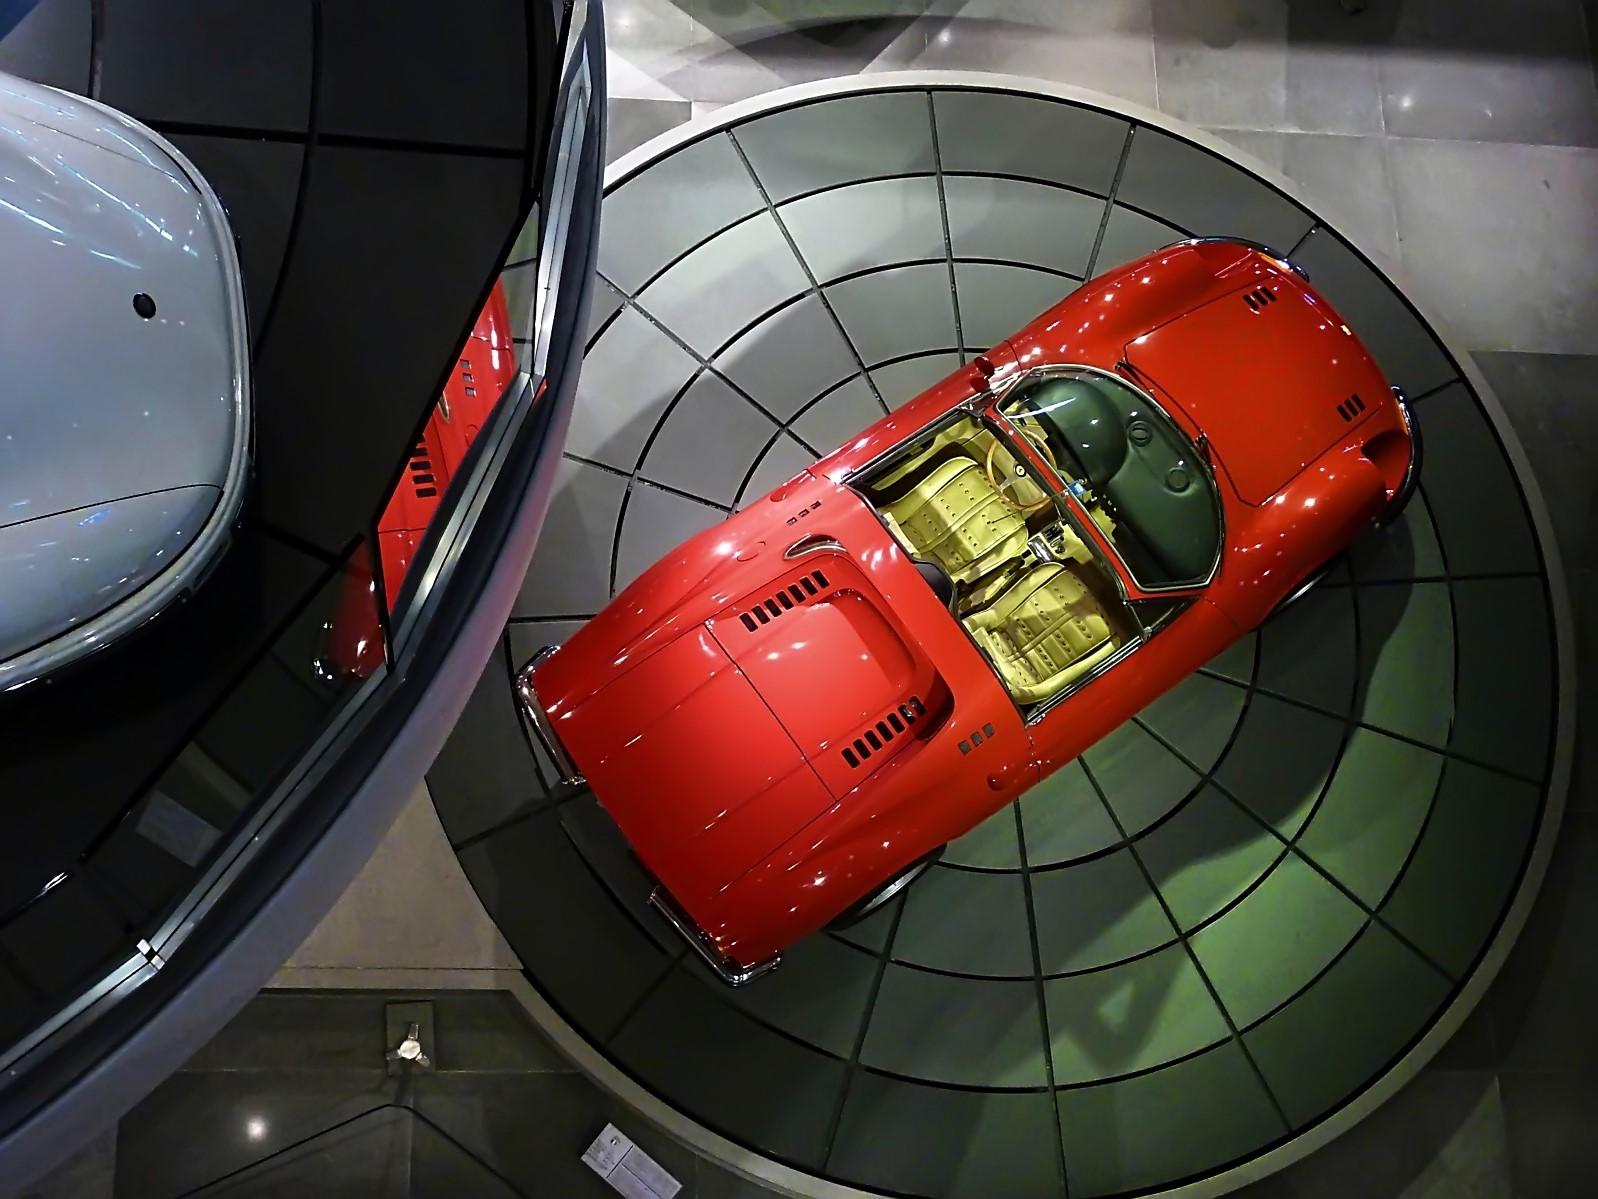 hellenic motor museum (28).JPG